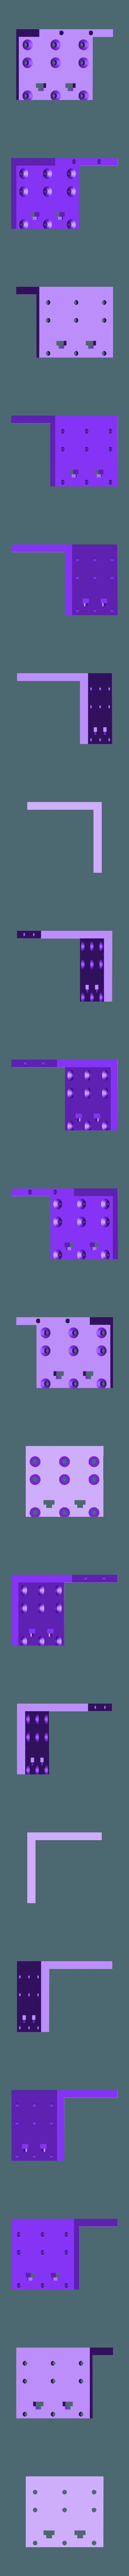 PCB_2_v57_PCB_2_v57_base_1_Body1_base.stl Télécharger fichier STL gratuit Cyclone PCB Factory Dual Z-axis • Objet pour impression 3D, TinkersProjects